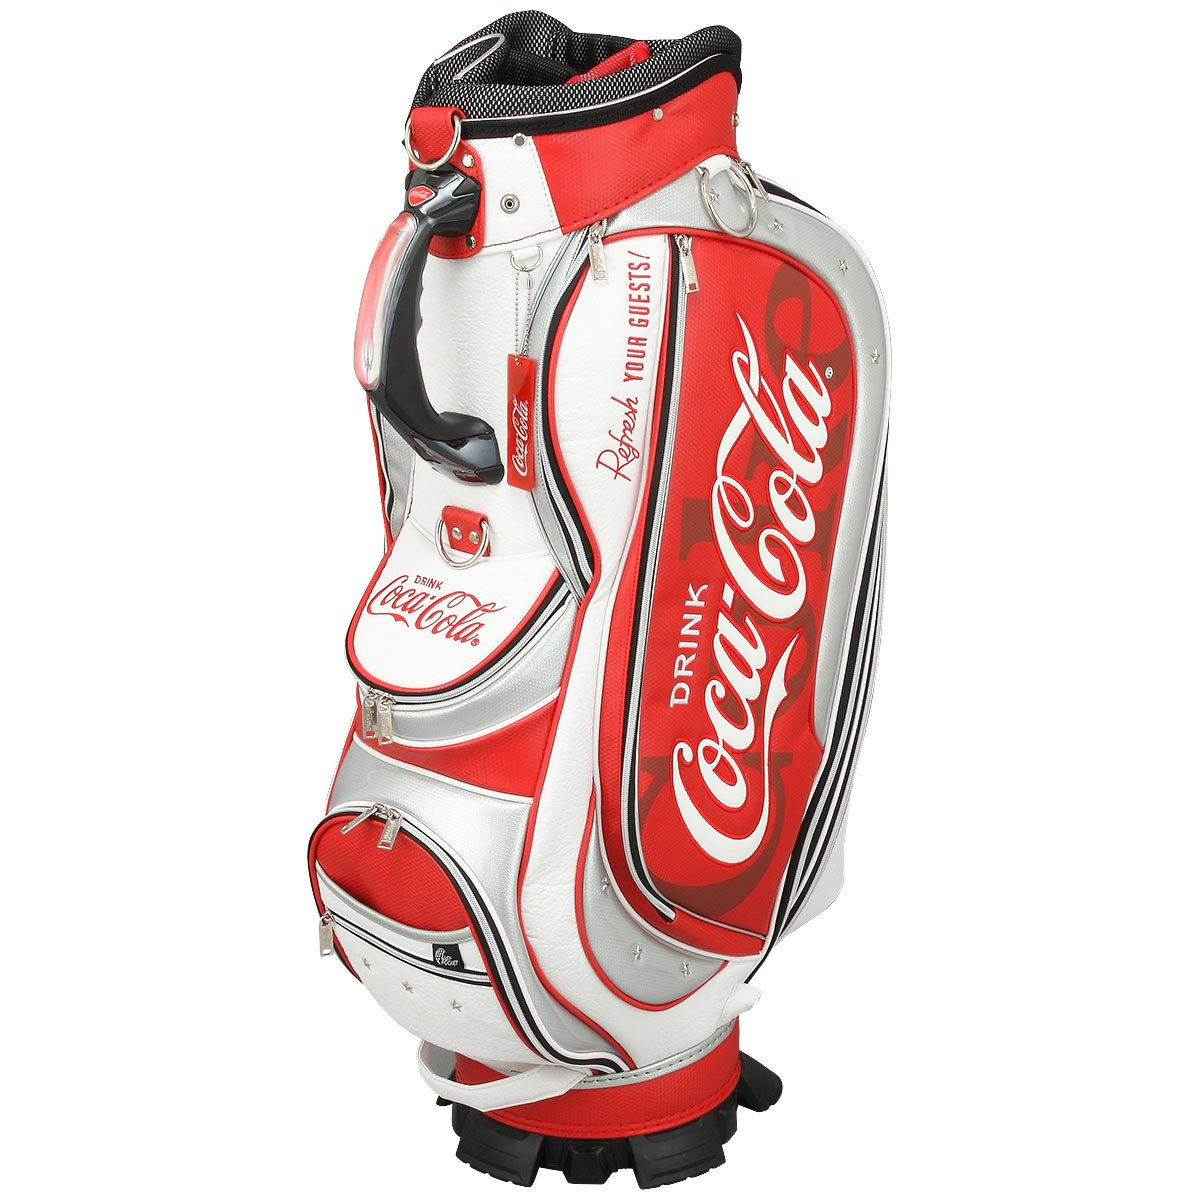 Coca-Cola(コカコーラ) ゴルフ キャディバッグ ホワイト×レッド B06WGV291Z